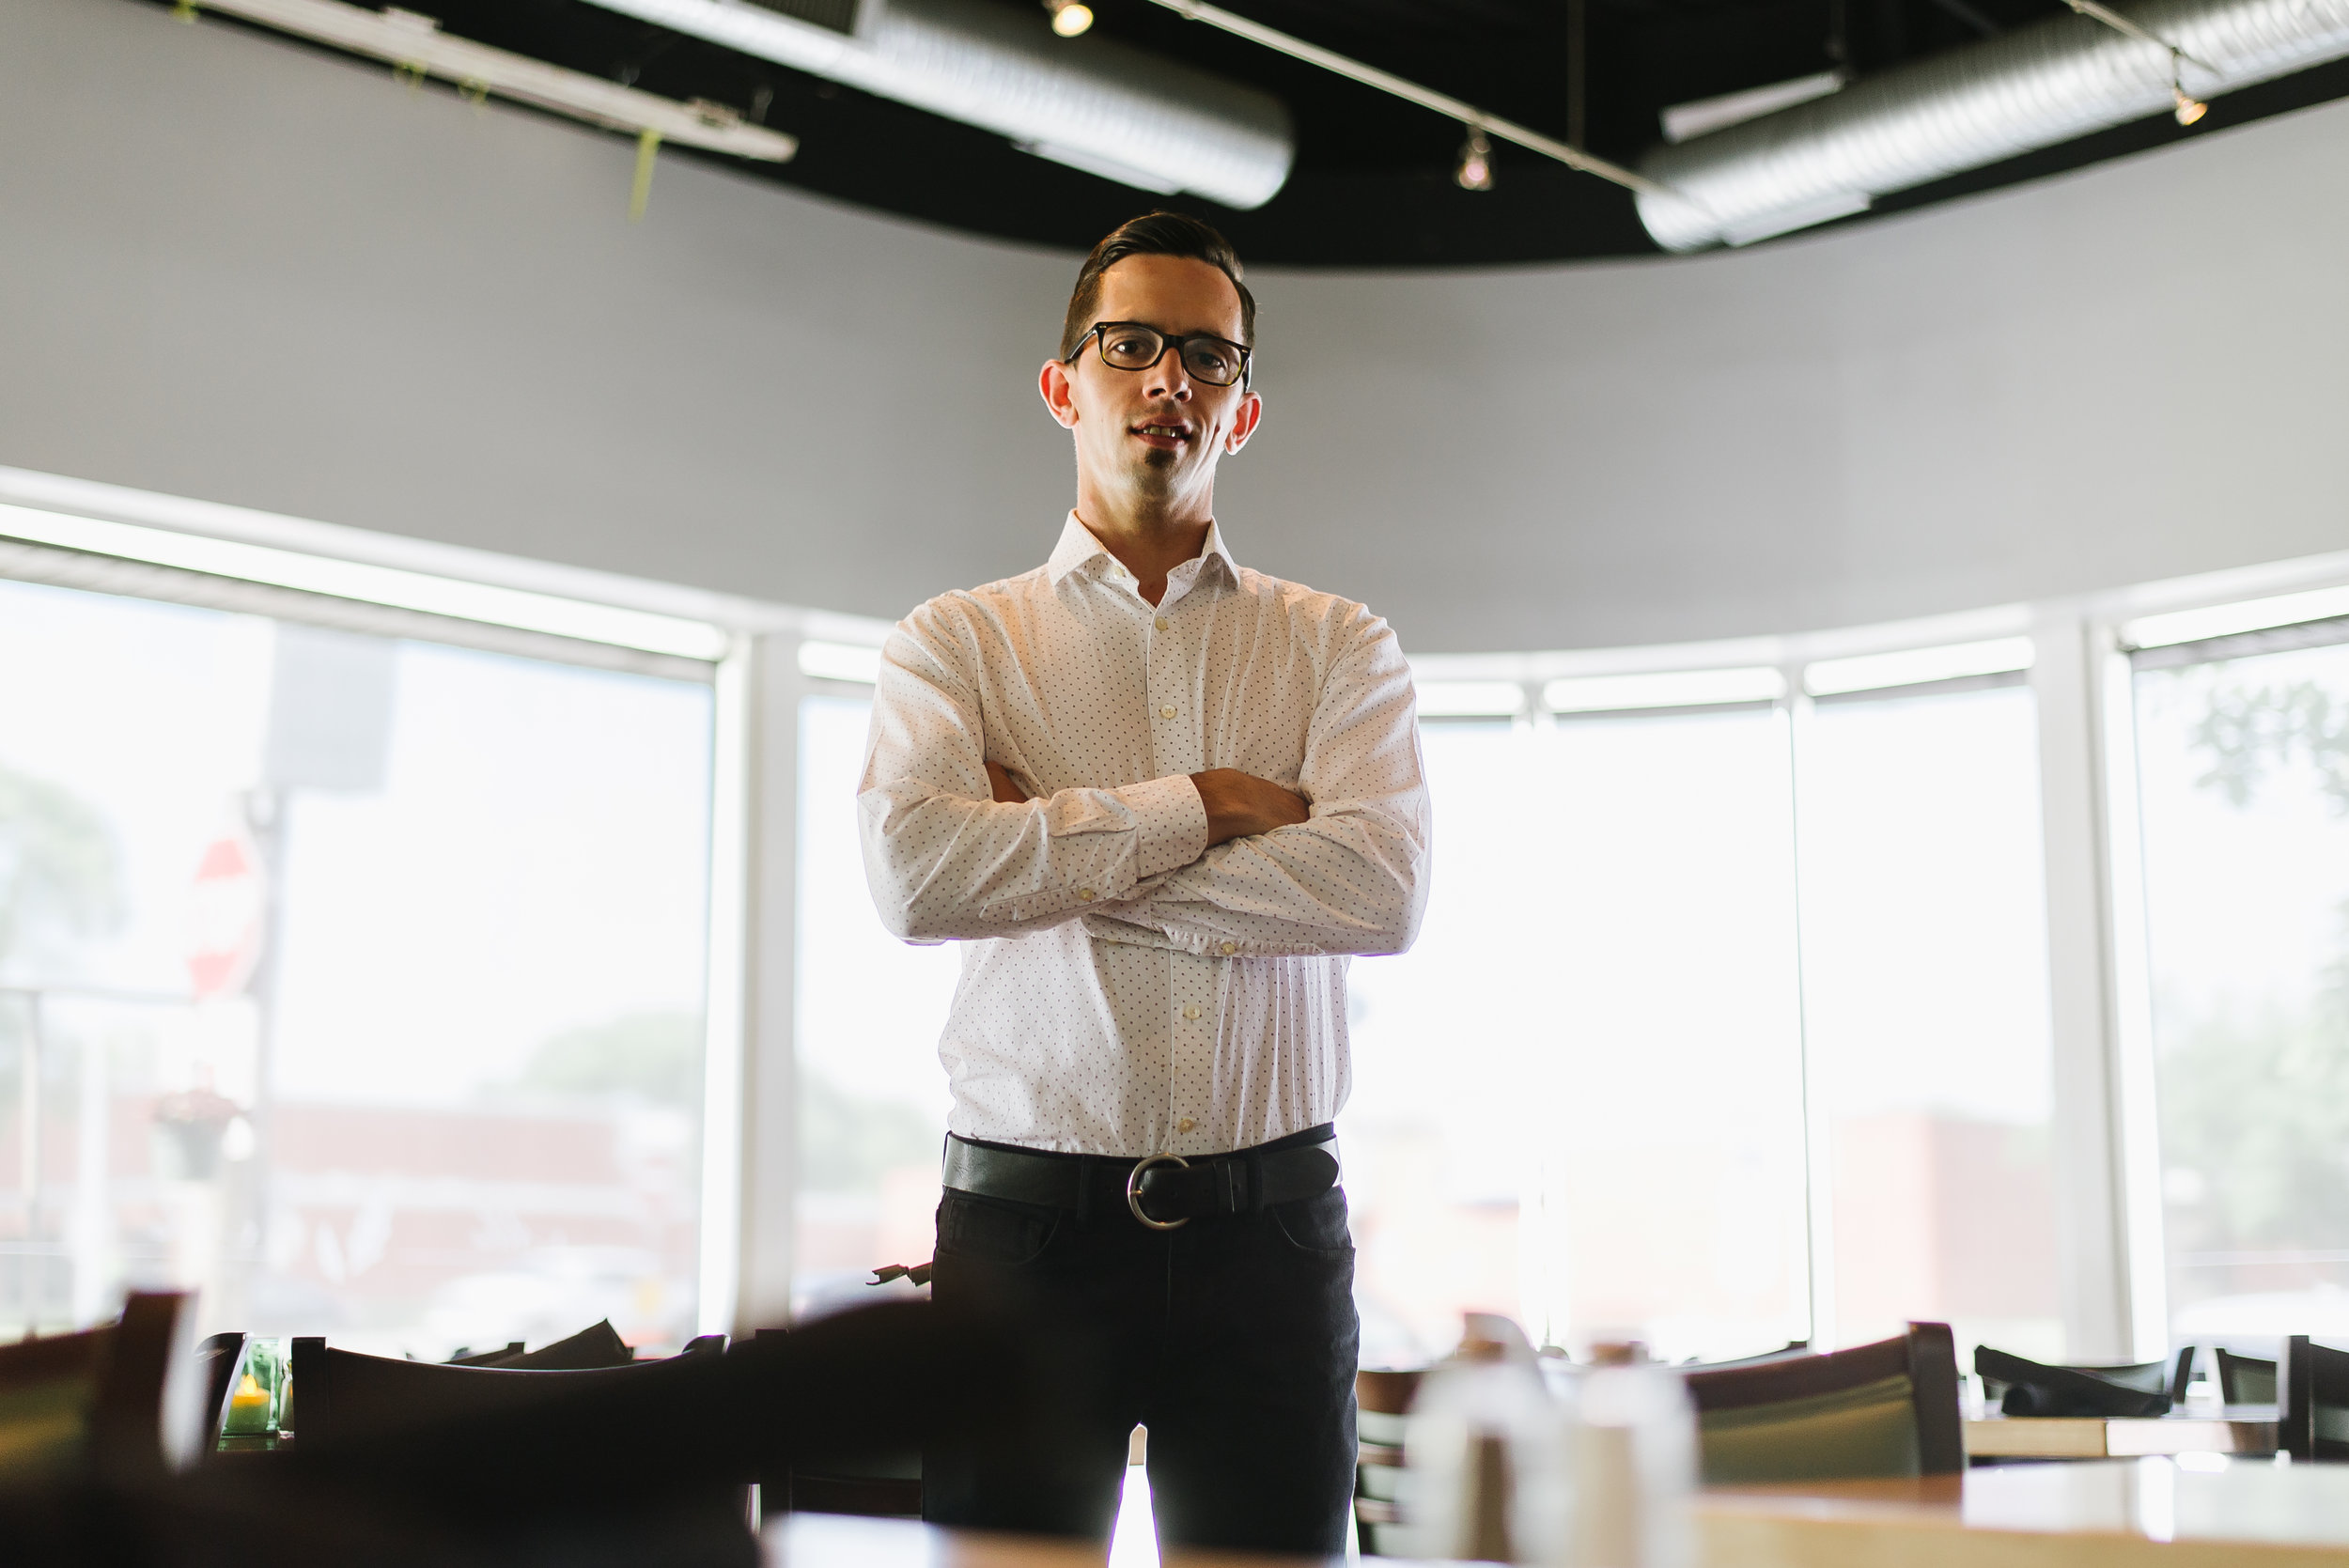 Garrett Dotsch, General Manager of Alba Restaurant in Des Moines, IA